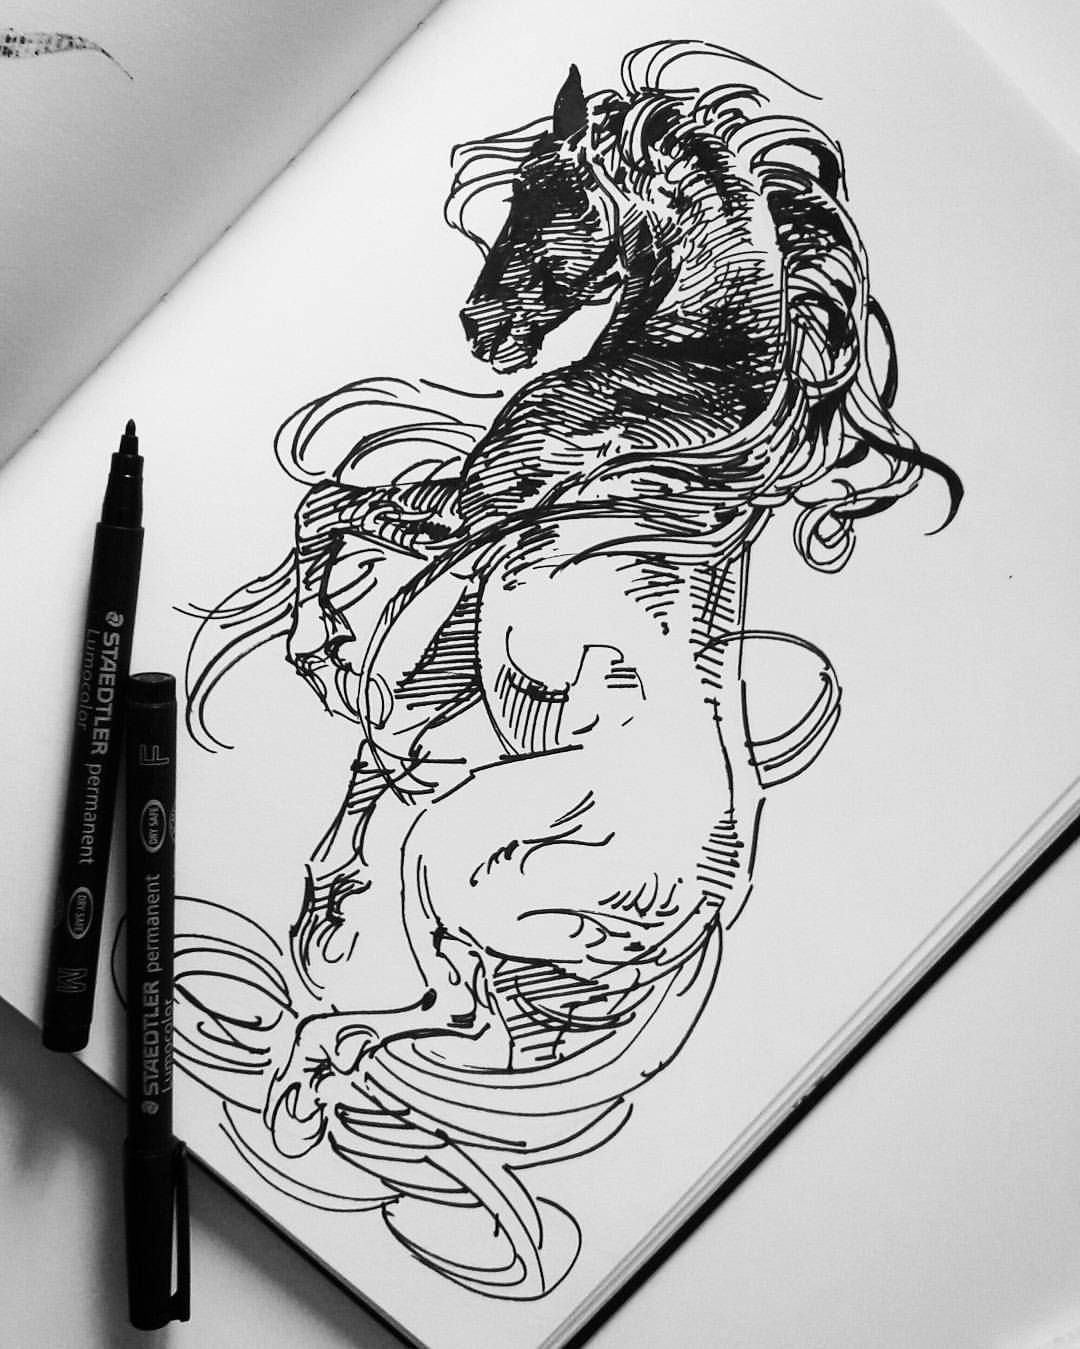 Pin by jessi sullivan on 39 tis art pinterest dibujos de caballos dibujar arte and arte - Dessin anime indien cheval ...